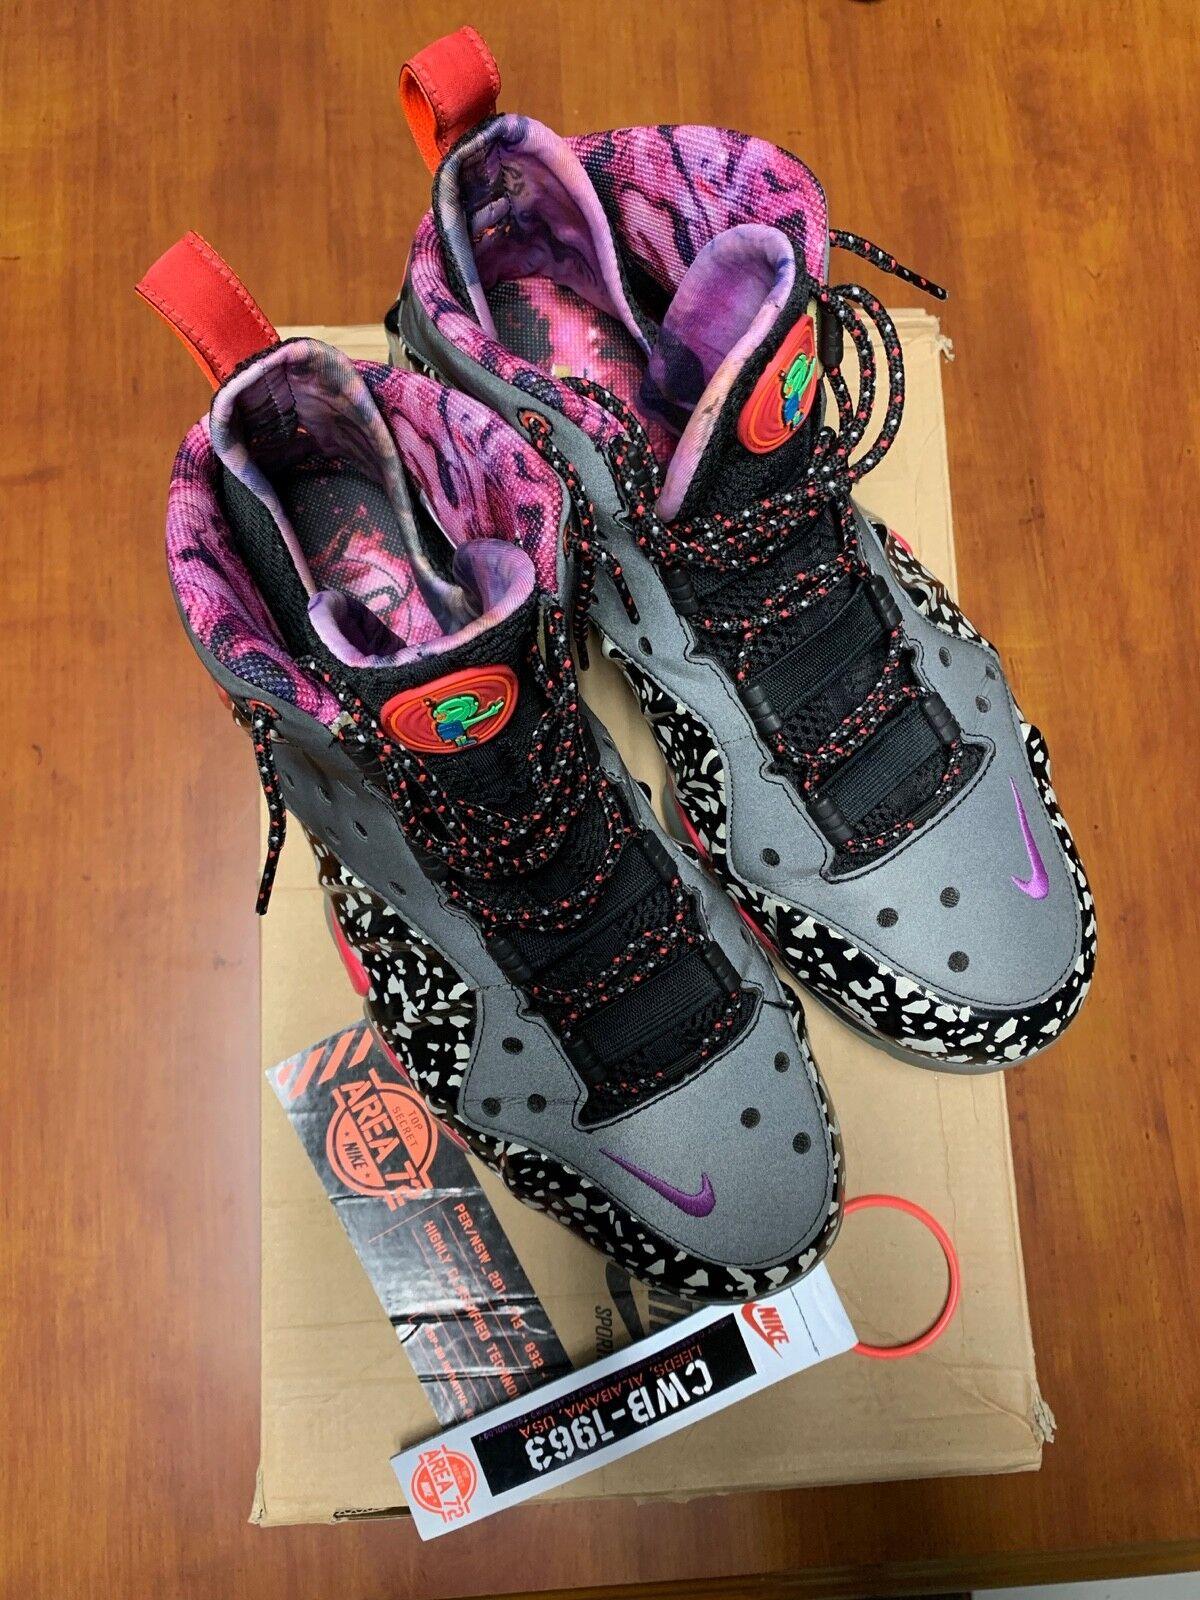 PRE - OWNED Nike Barkley Posite Max Area 72 sz 11